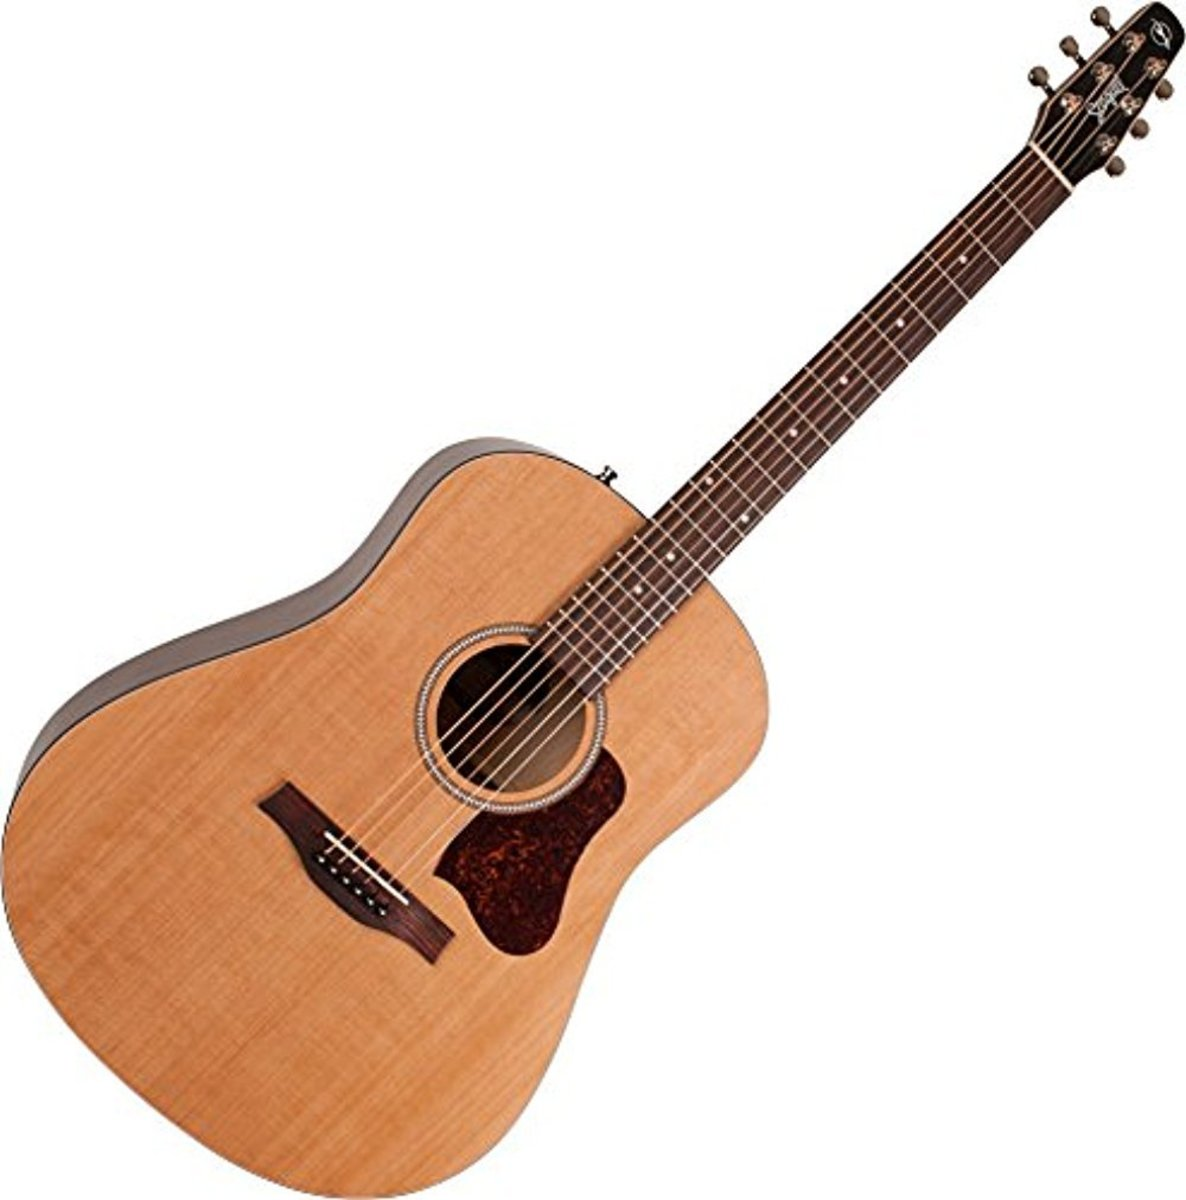 5 Best Acoustic Guitars Under $500 in 2020